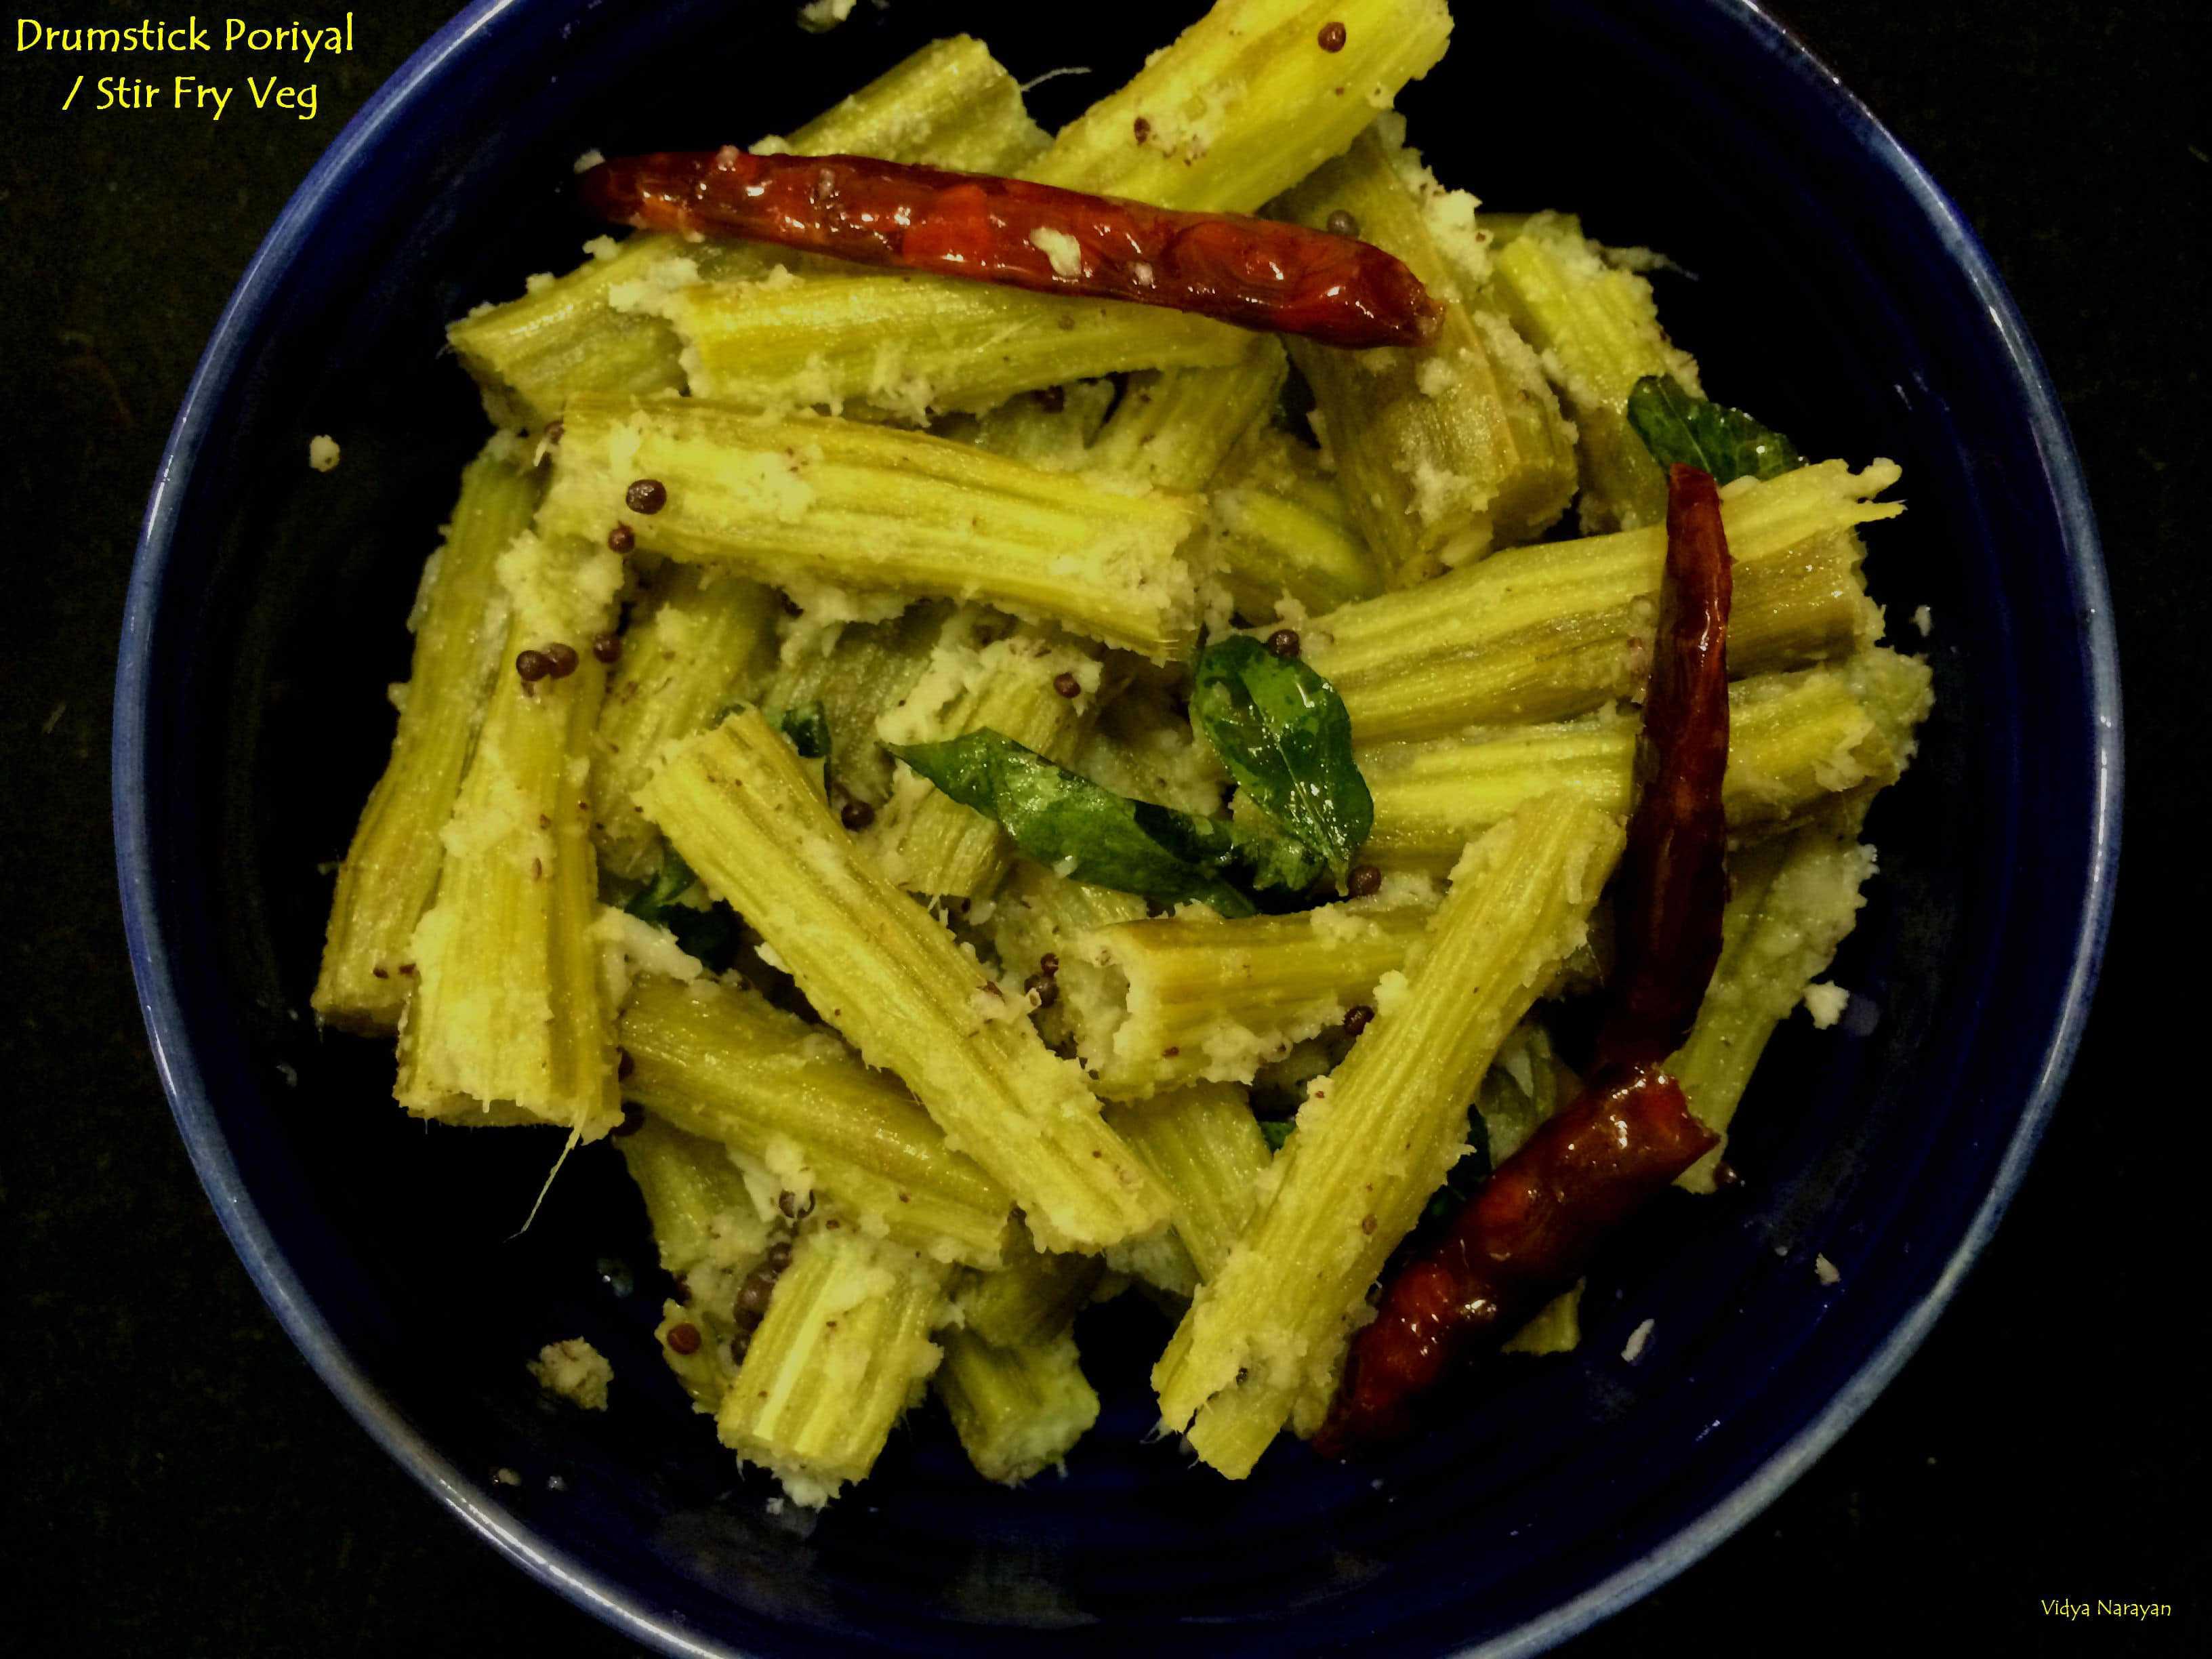 Drumsticks Poriyal (South Style Stir fry)